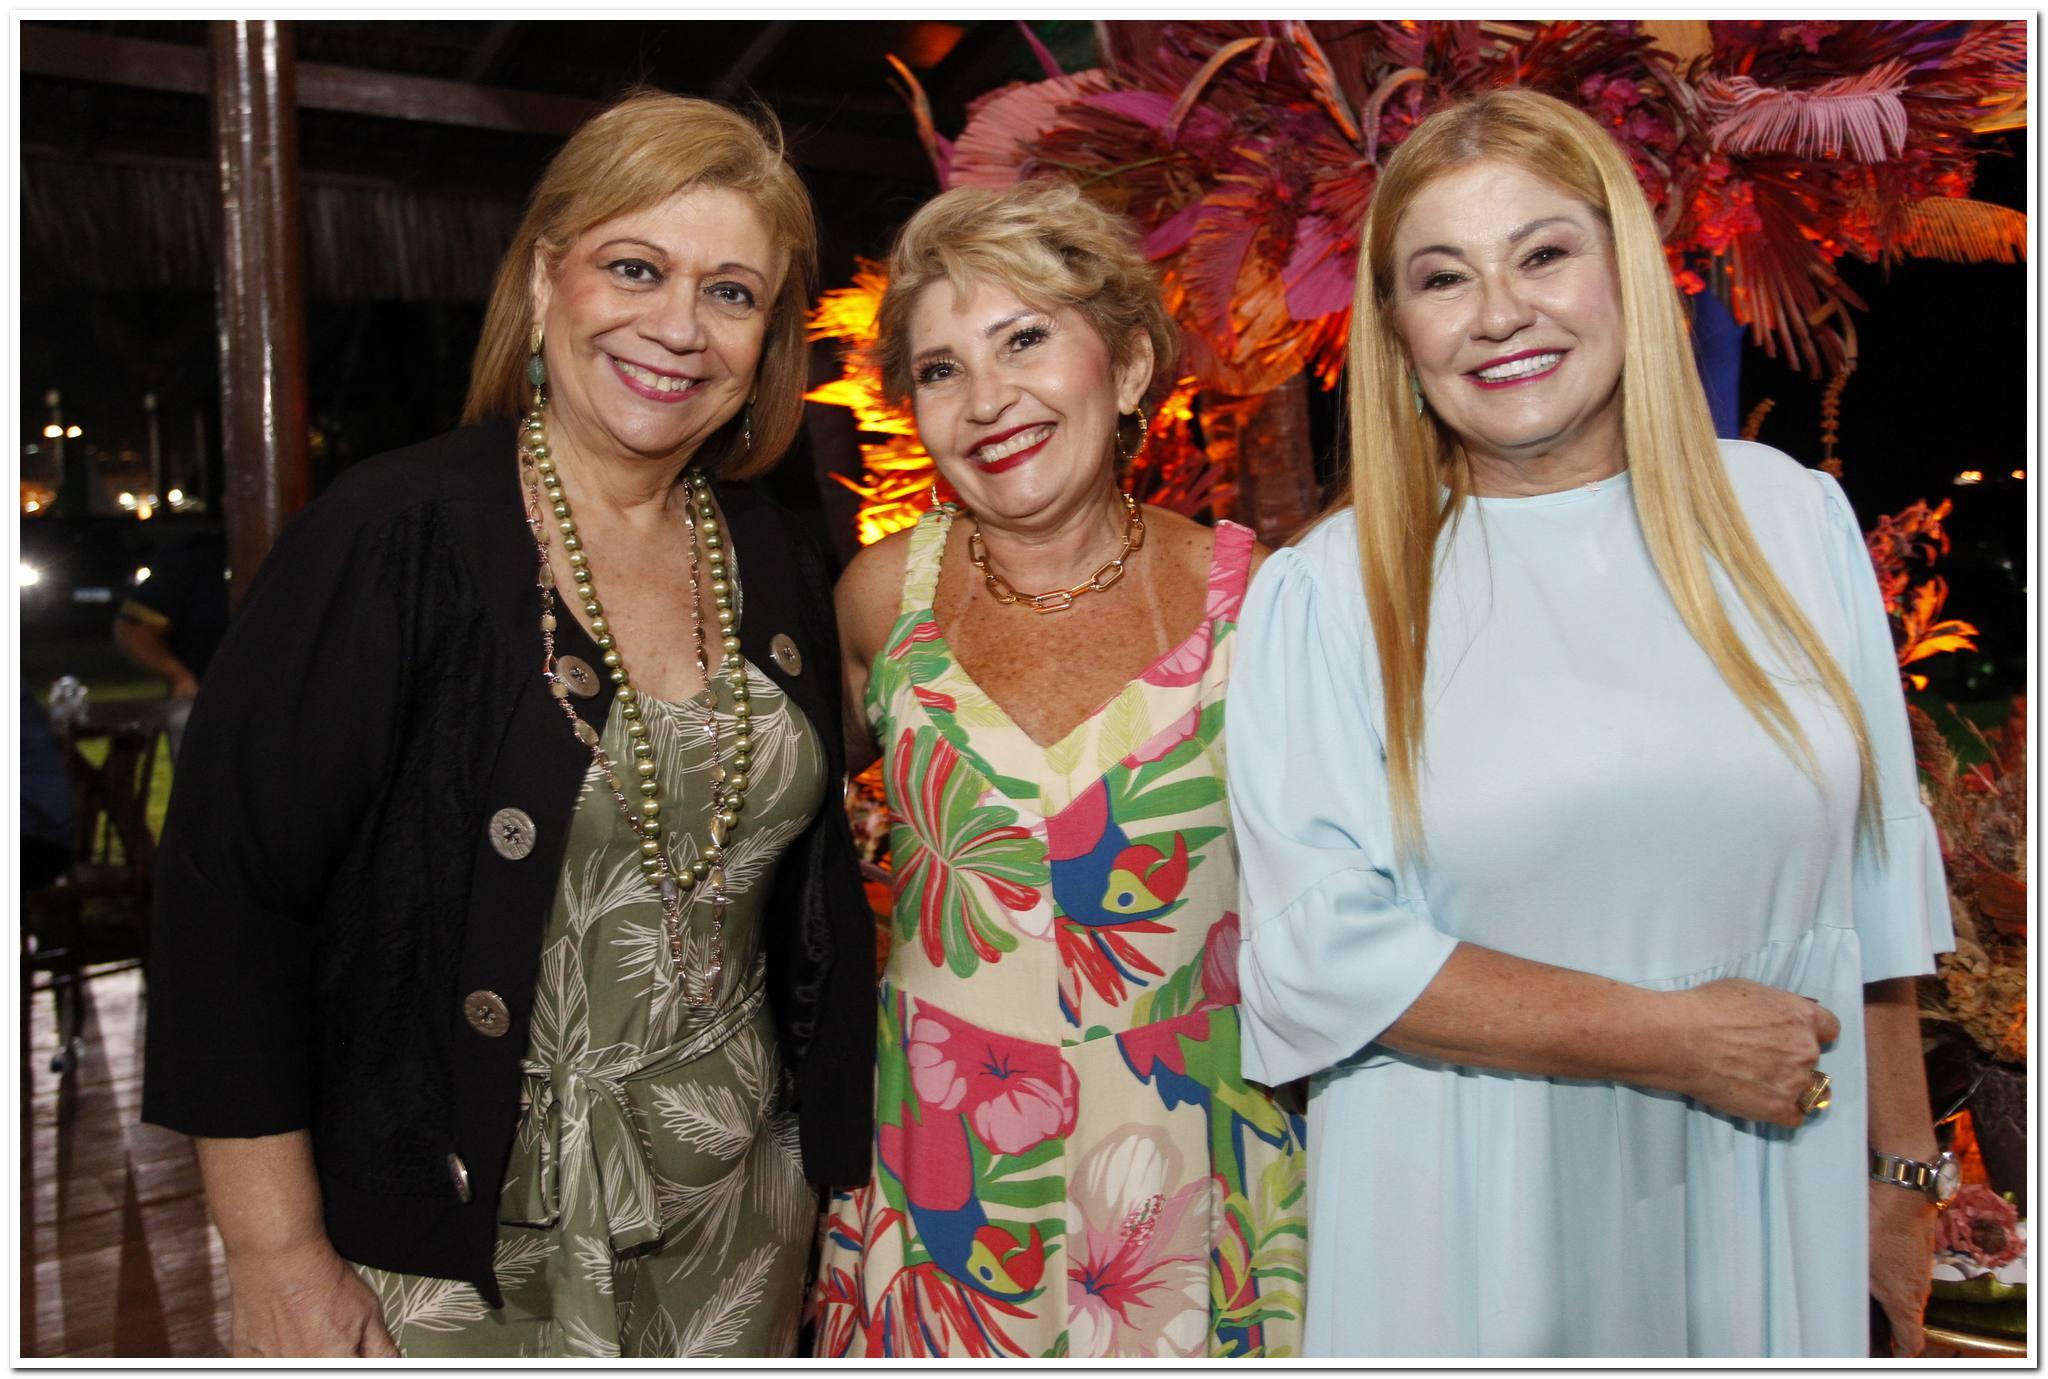 Priscila Cavalcanti, Salete Araujo E Stela Salles